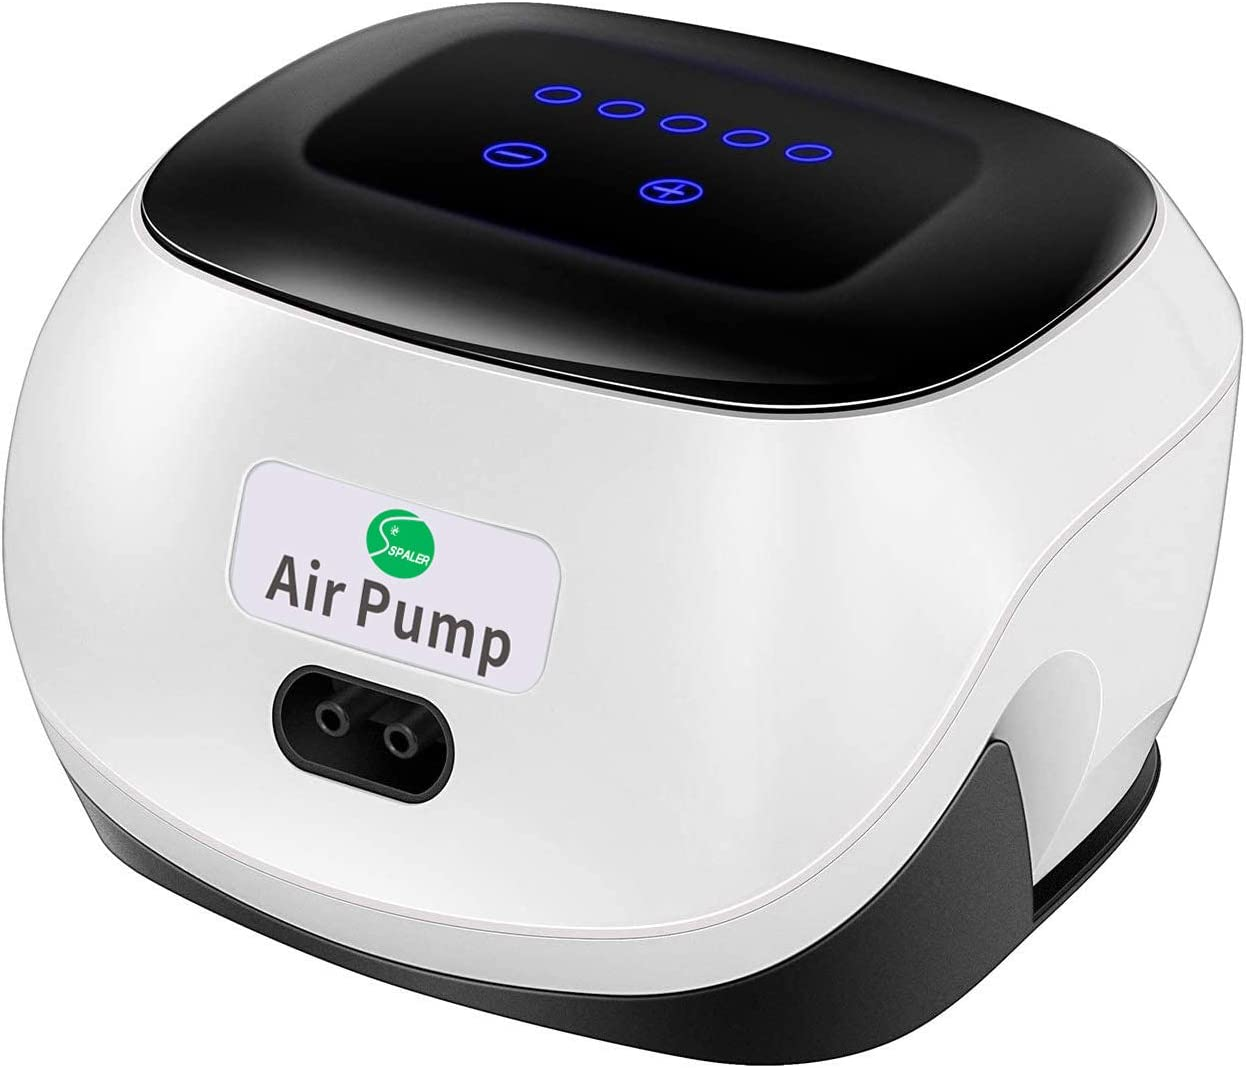 SPALER Aquarium Air Pump Fish Tank air Pump with Dual Outlet 2Stones 2Tubes 2 Check Valve Five Gear air Volume Touch Mold Adjustment